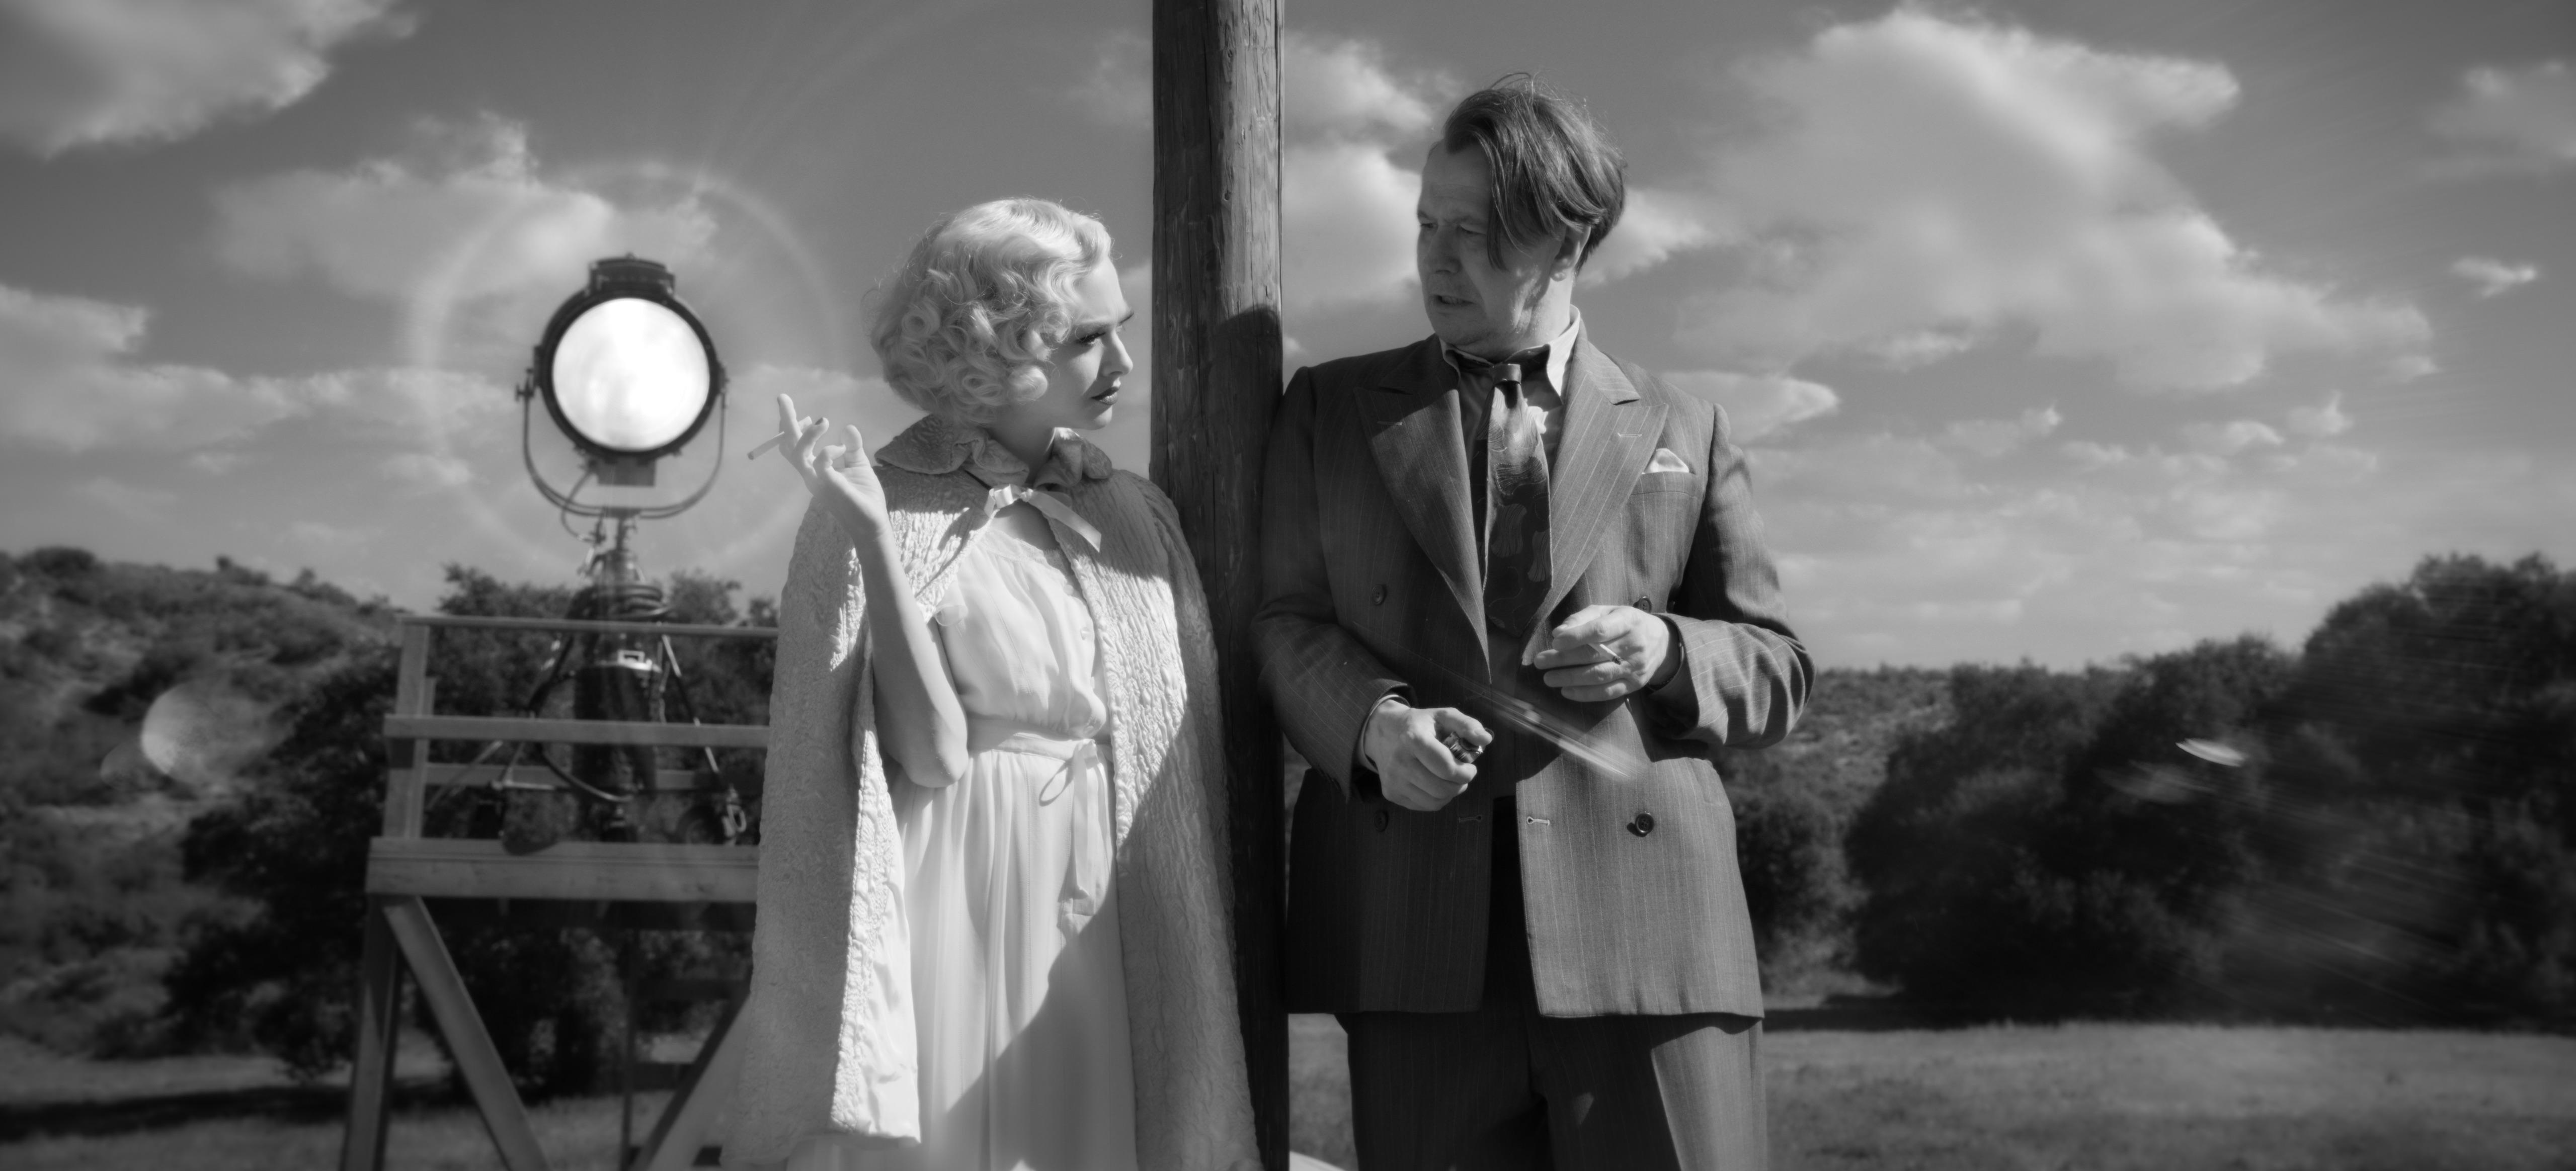 Gary Oldman and Amanda Seyfried in Mank (2020)